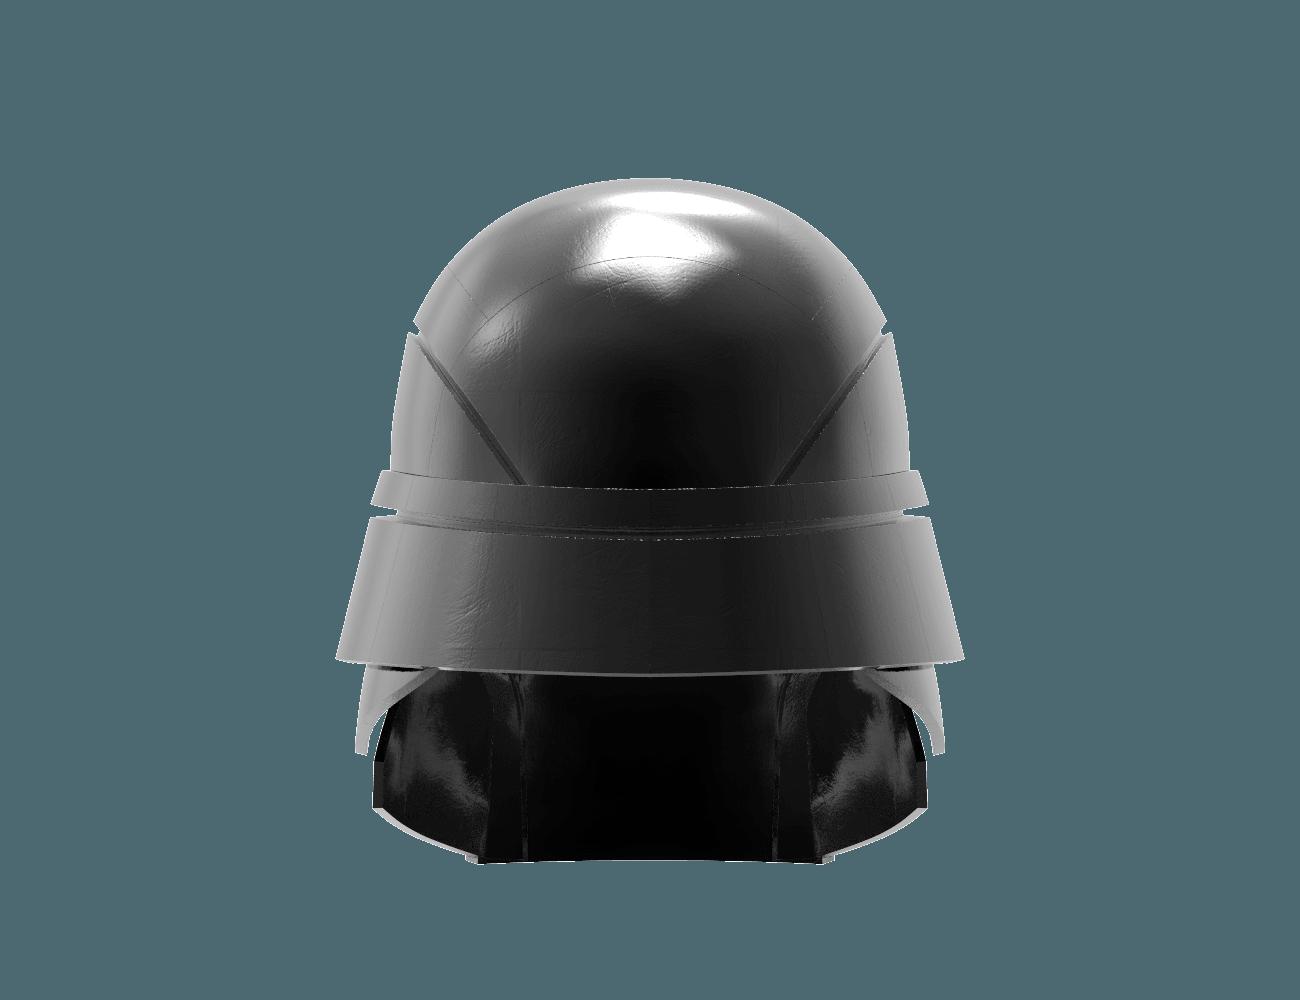 render_scene-back.27.png Download STL file Armory - Knights of Ren Helmet, StarWars model for 3D Print • 3D printing design, 3D-mon